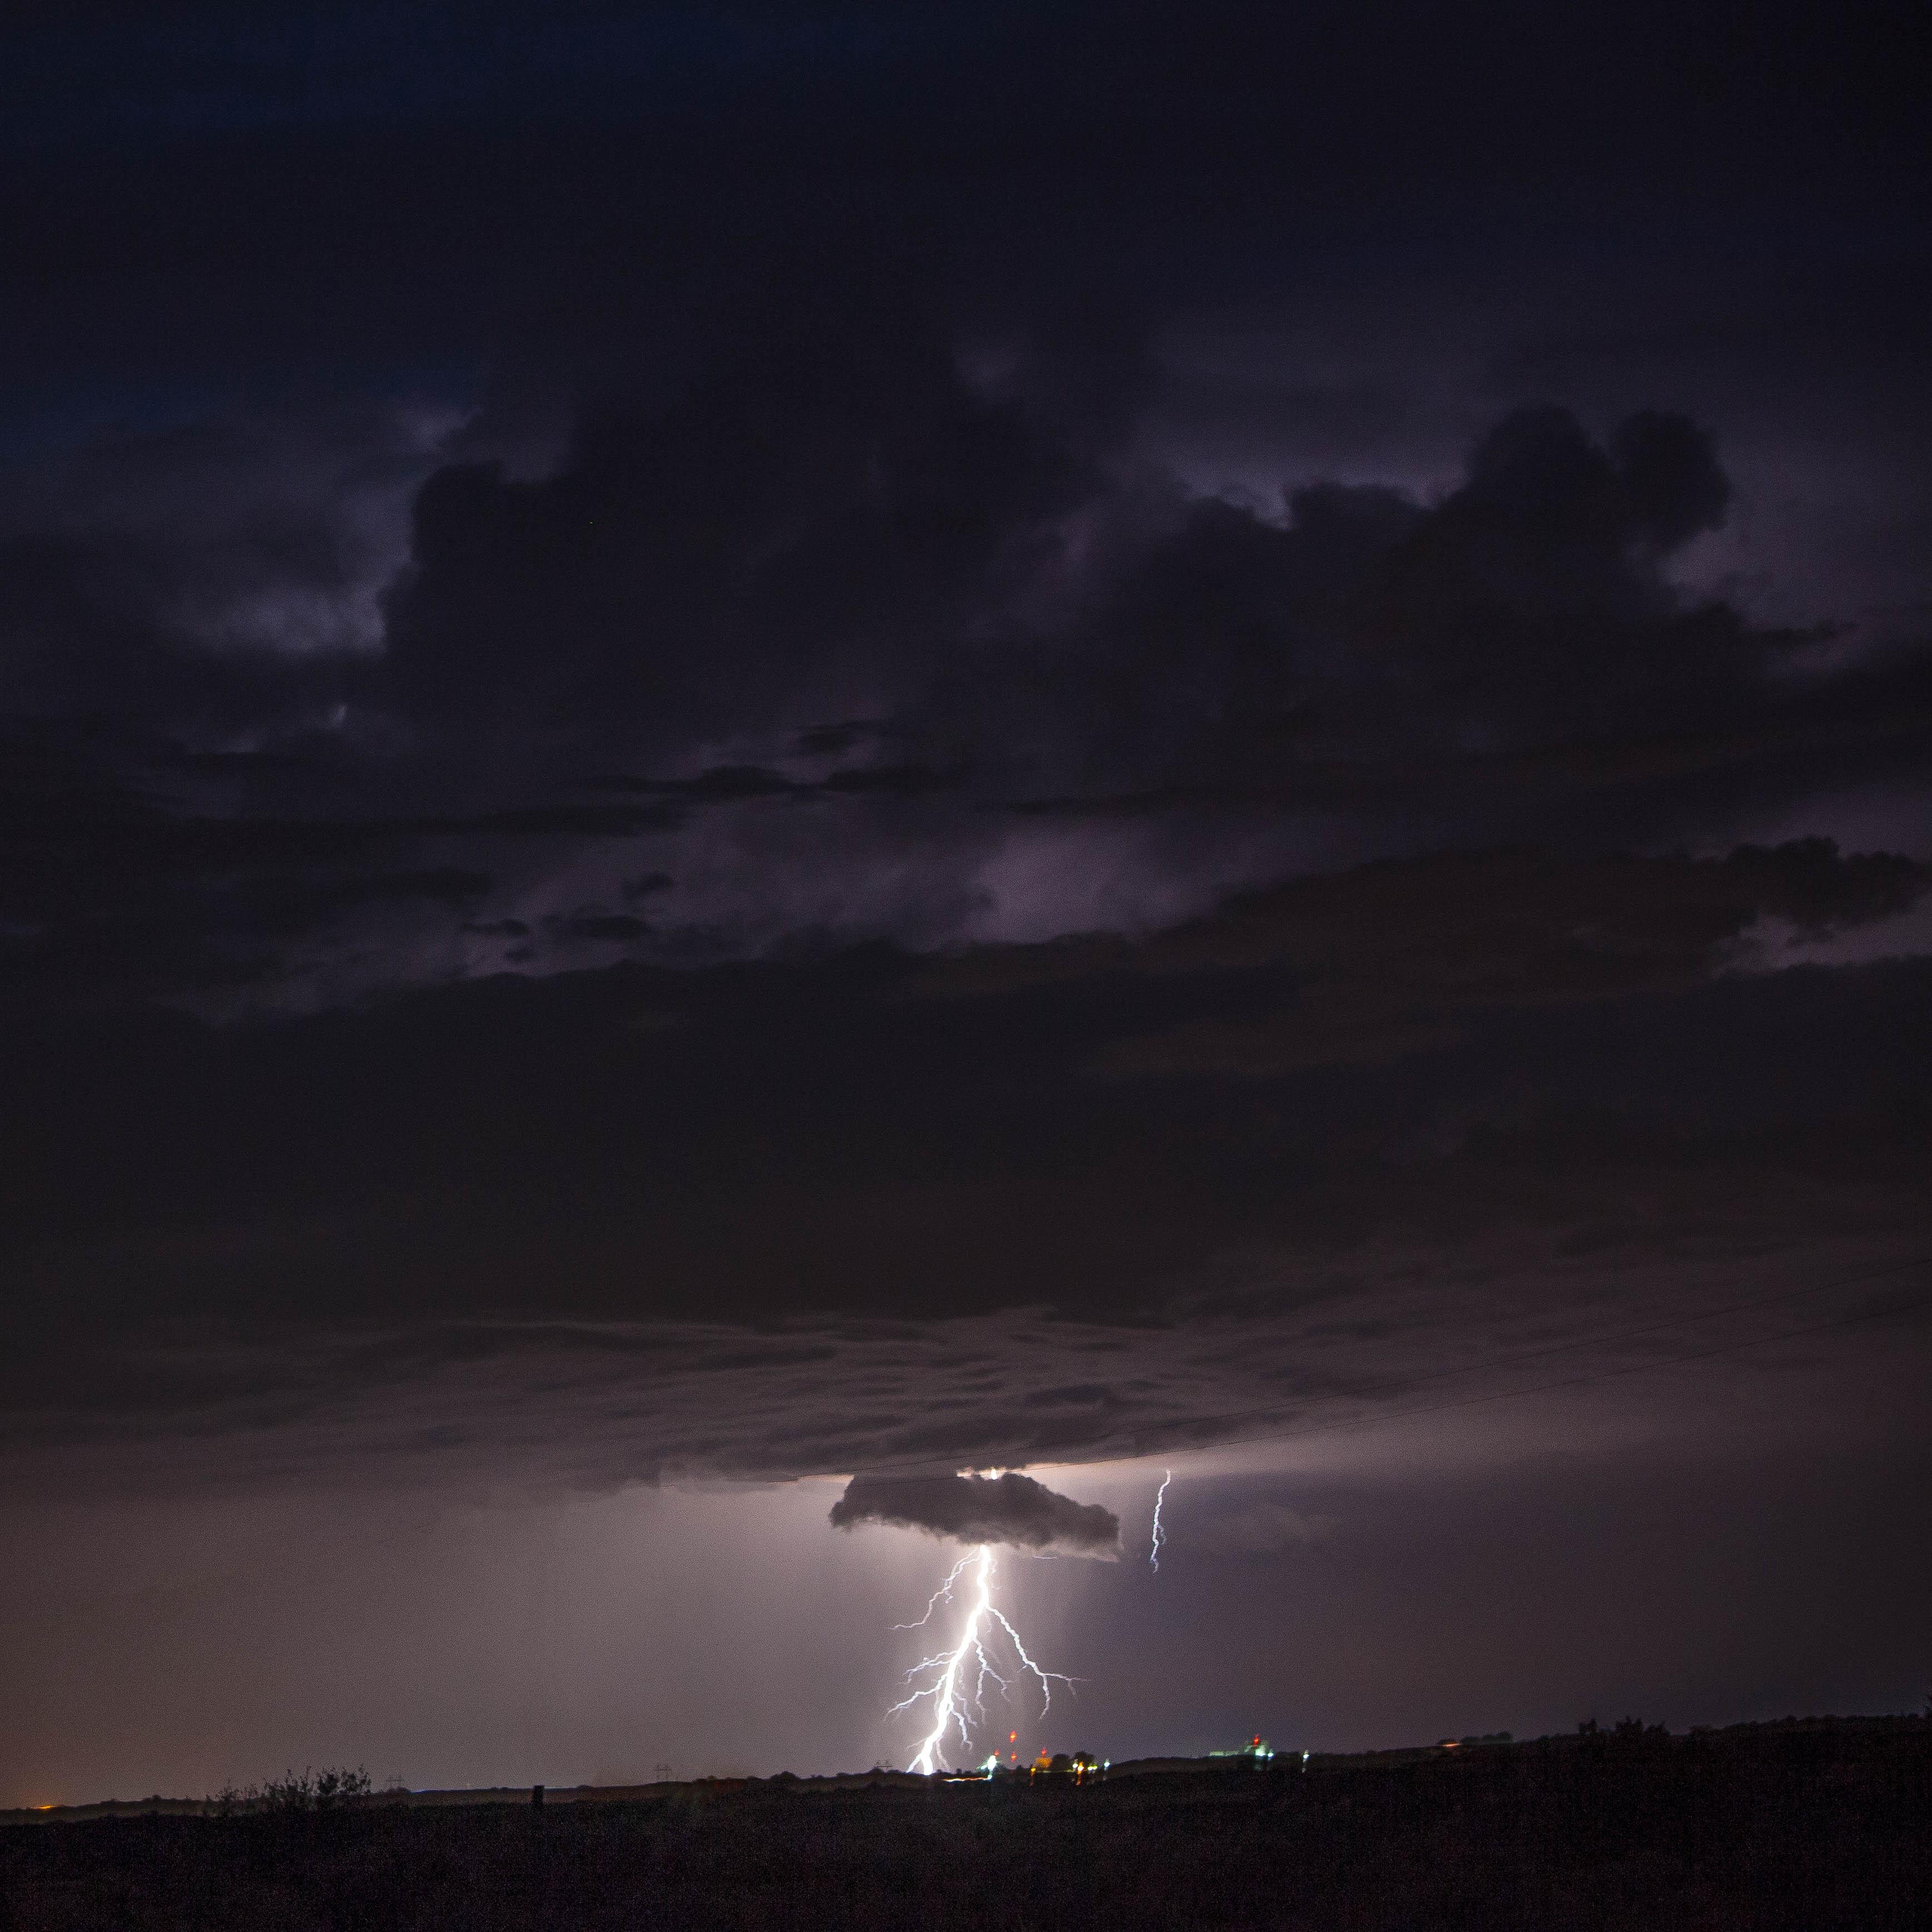 Thunderstorms And Tornadoes idaho - thunderstorms, tornadoes, and rainbows - amanda + justin +